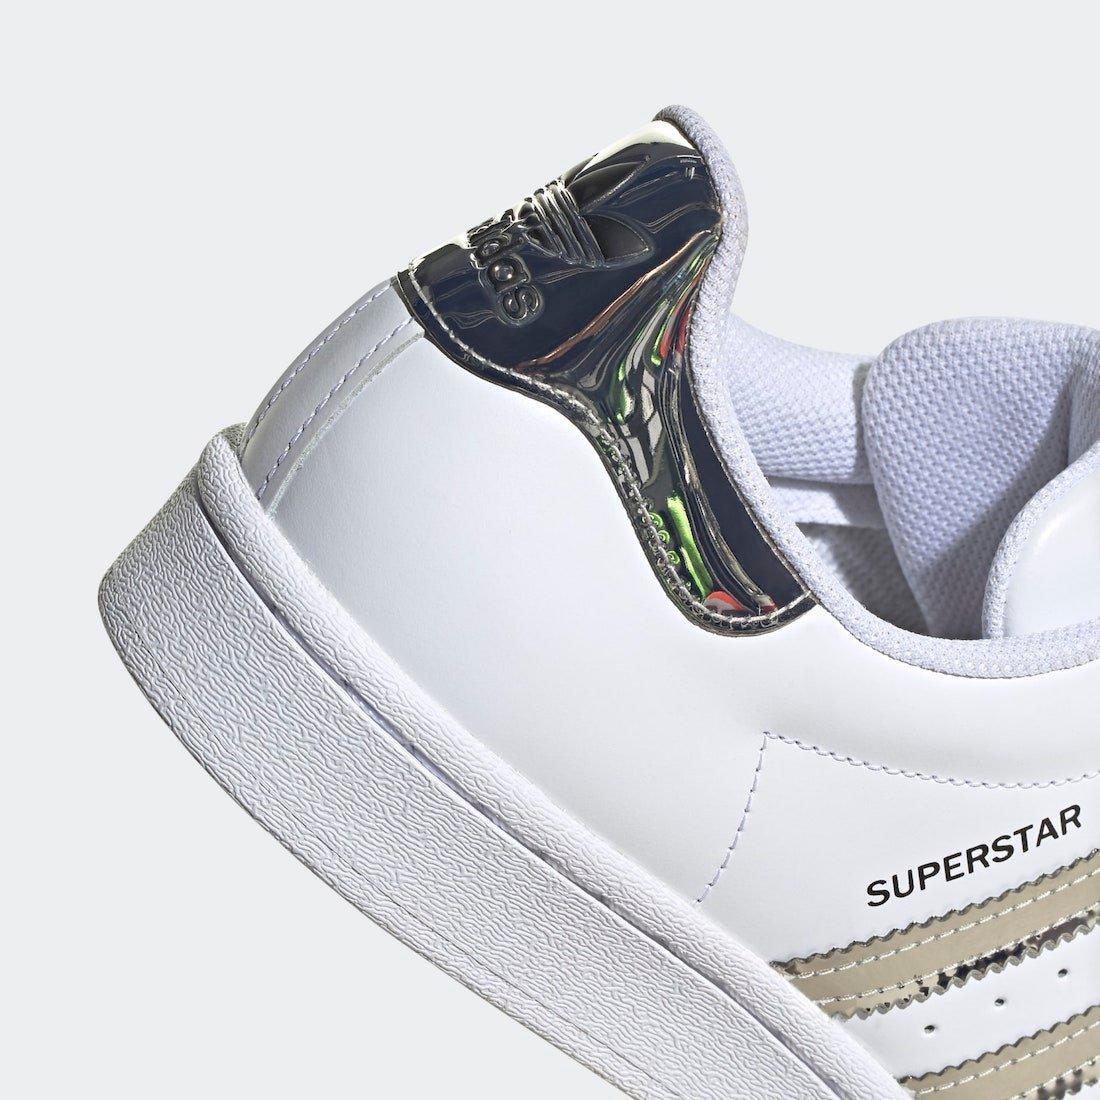 adidas Superstar White Silver Metallic FW3915 Release Date Info